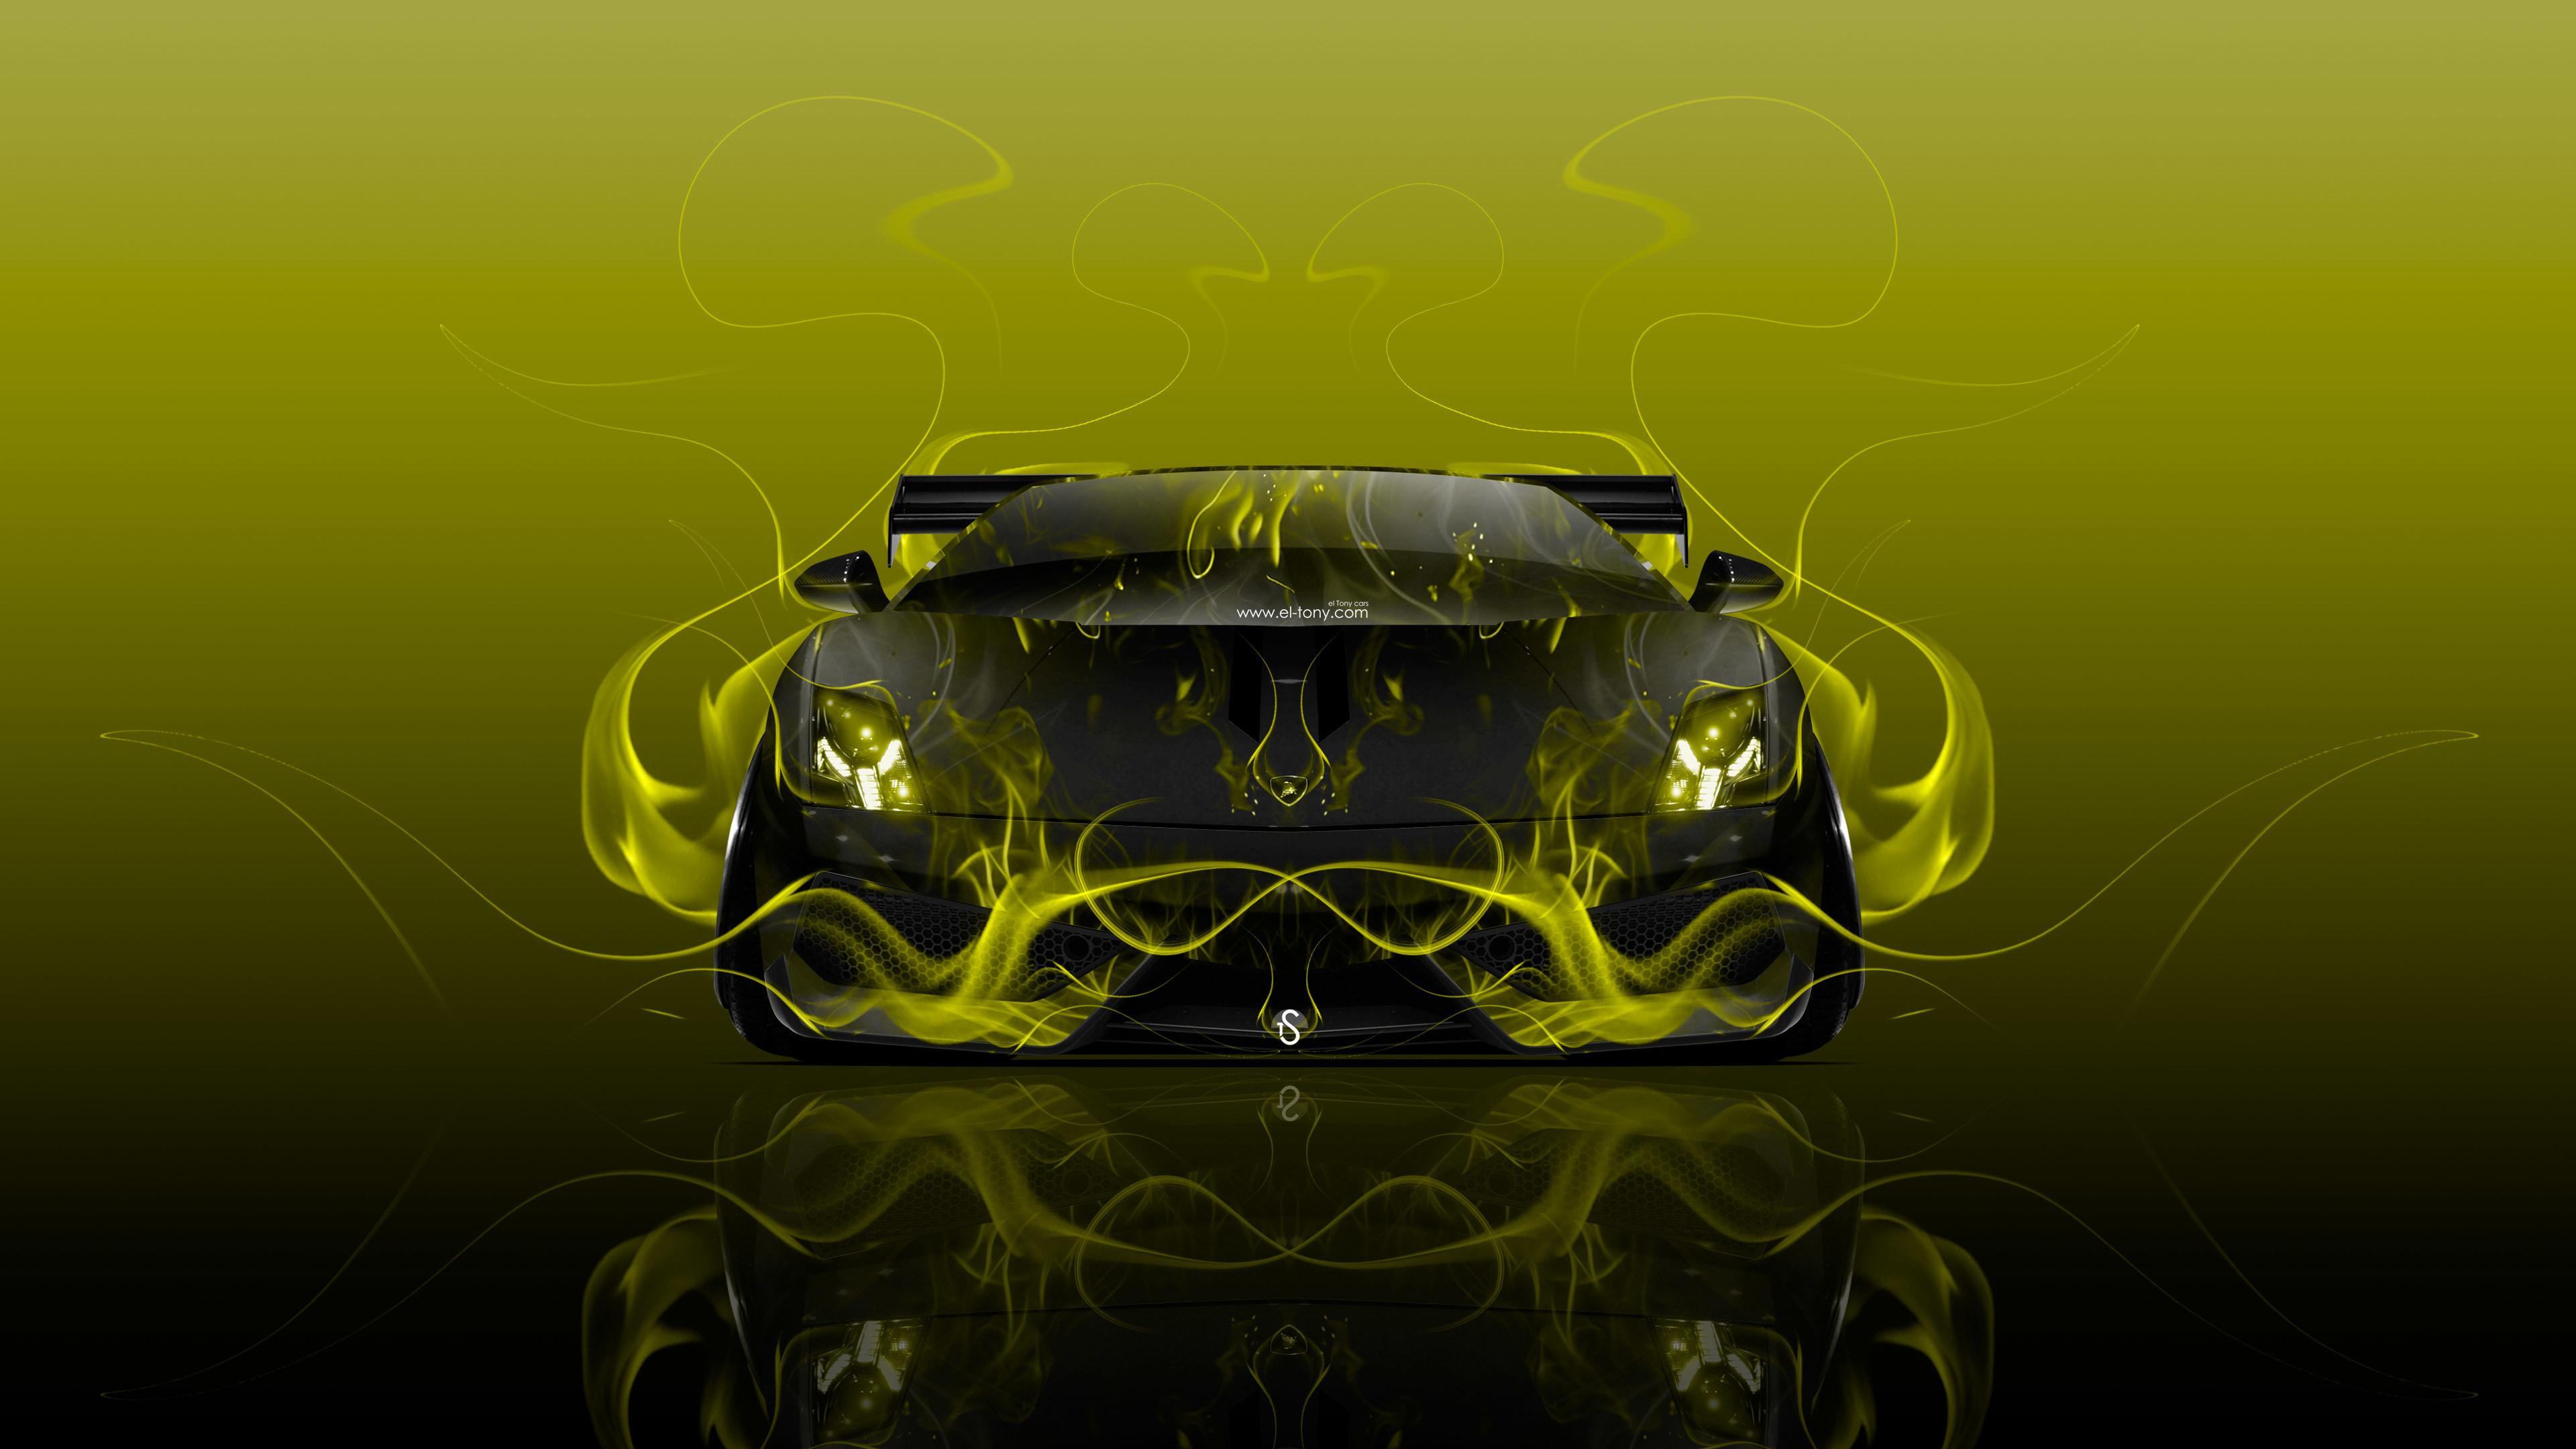 Lamborghini Gallardo Tuning Front Fire Flame Abstract Car